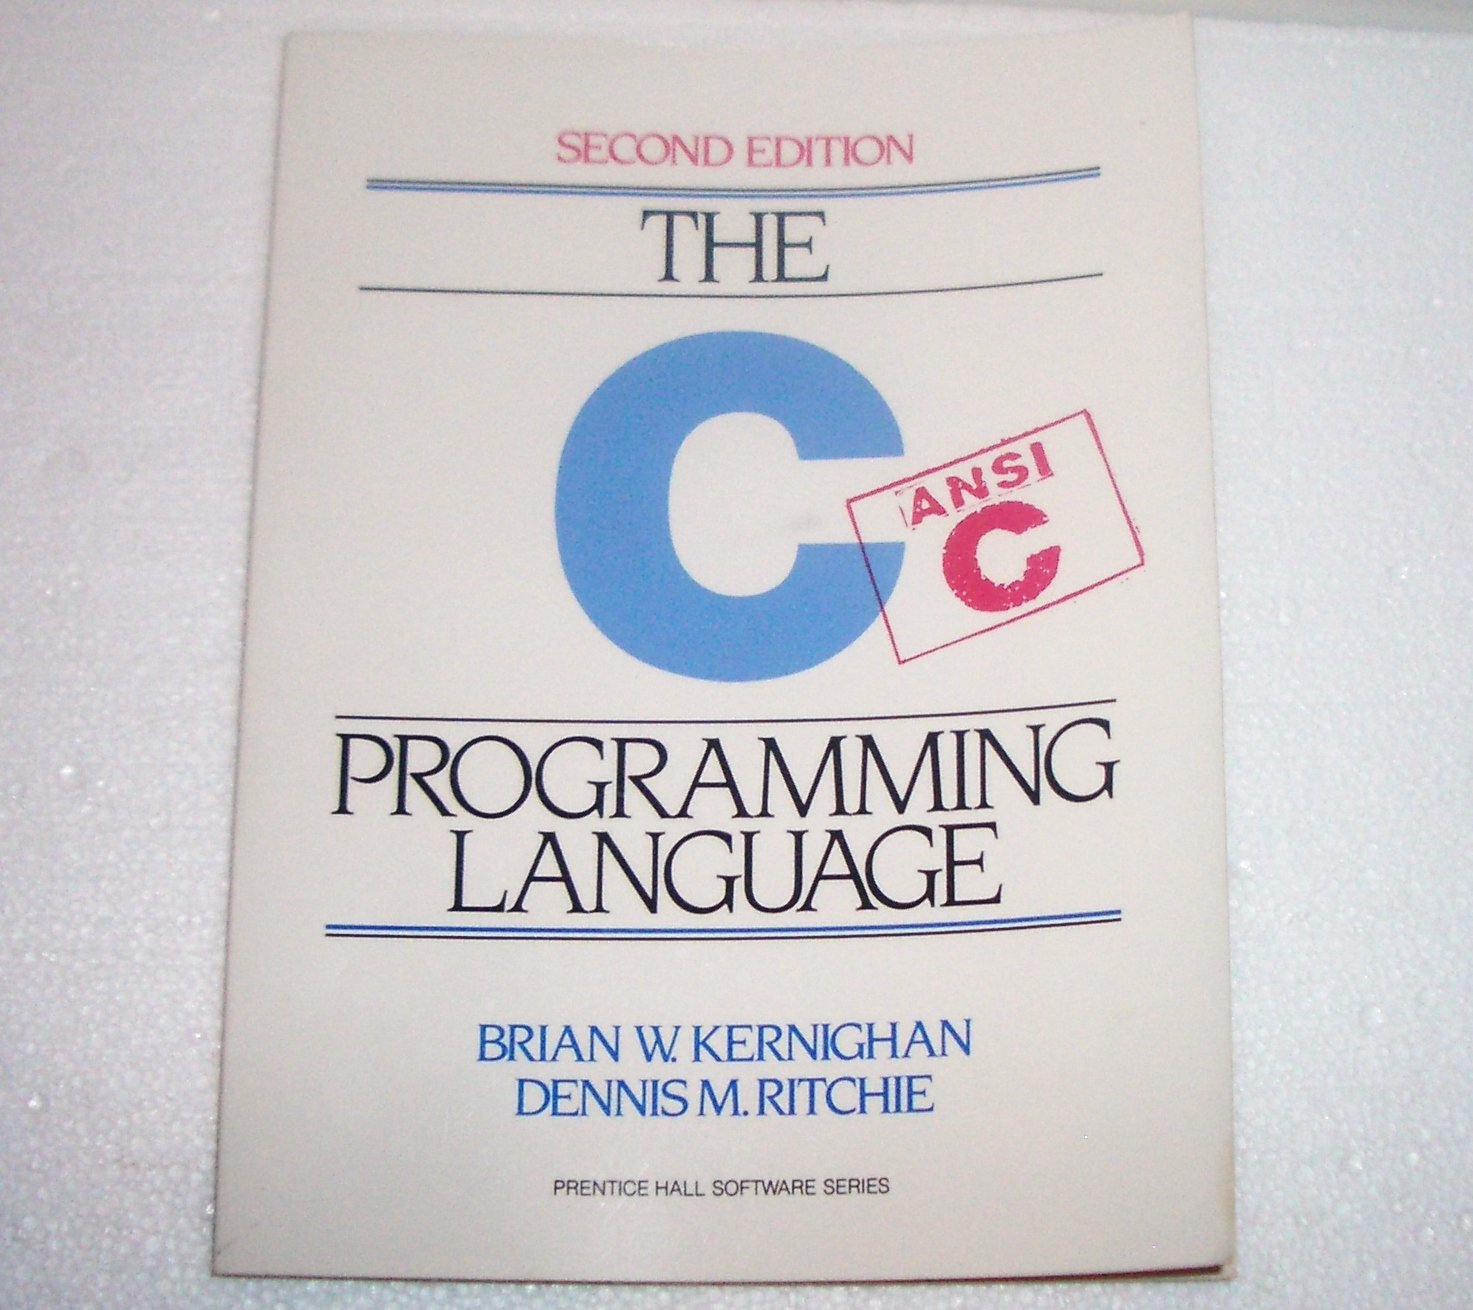 C Programming Language (2nd Edition) by Brian Kernighan, Dennis M. Ritchie 1988